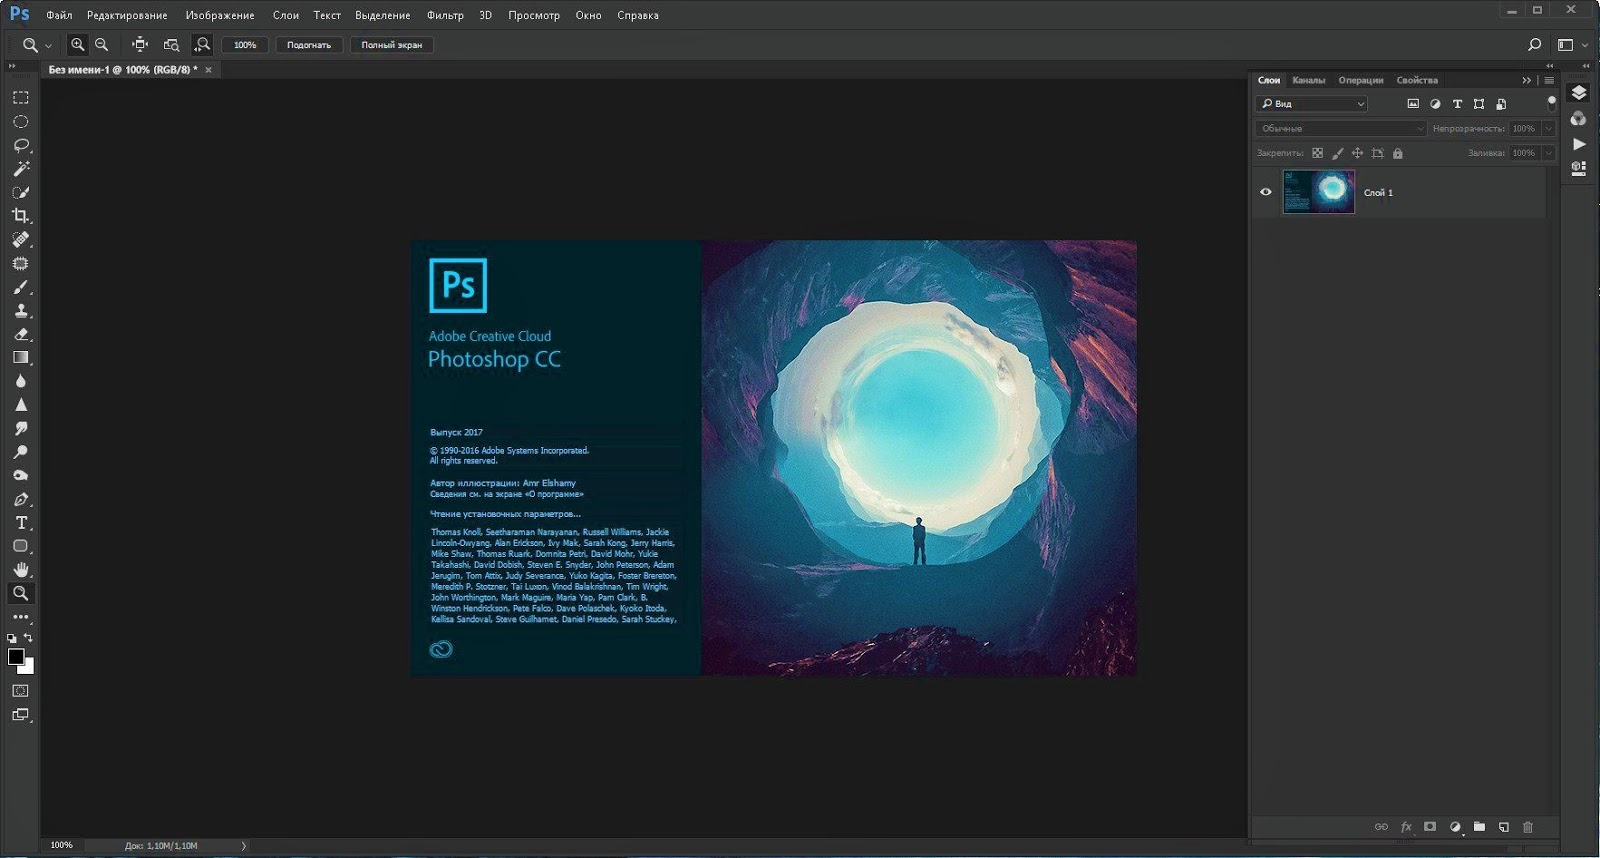 Adobe Photoshop CC 2017 Full Version